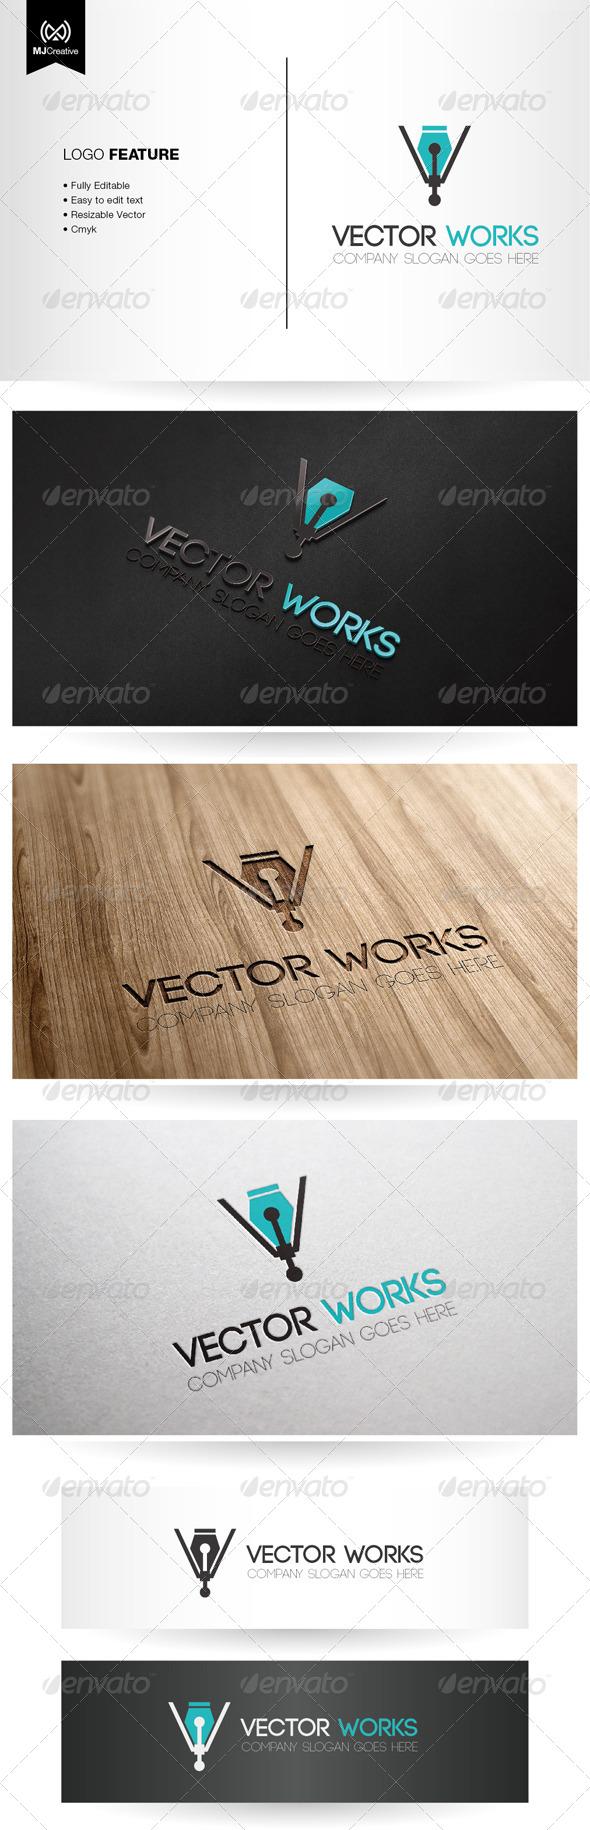 Vector and Digital Pen Logo